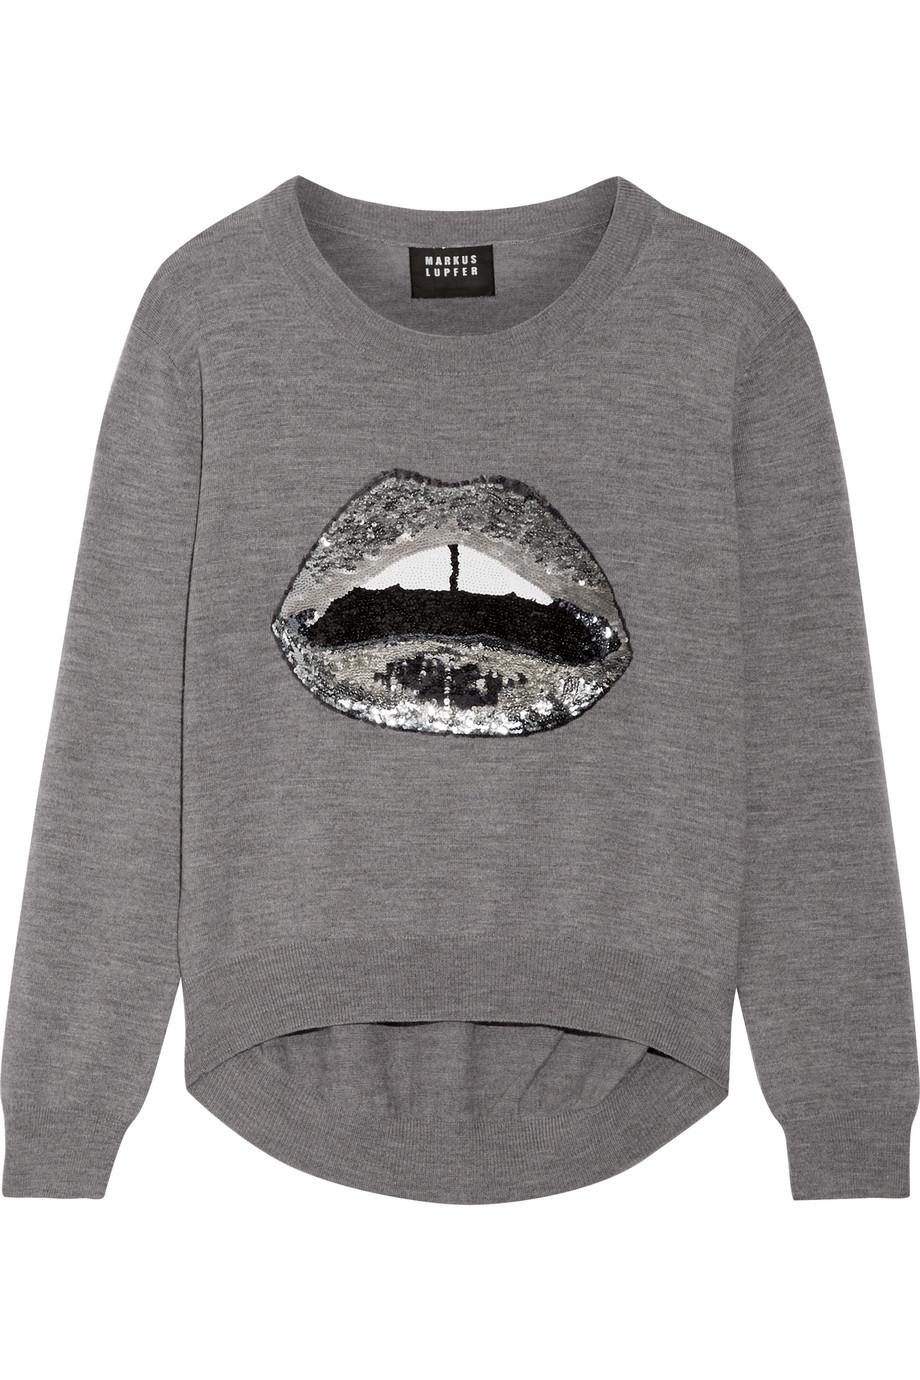 Markus Lupfer Lara Lip Joey Sequin-Embellished Merino Wool Sweater, Anthracite, Women's